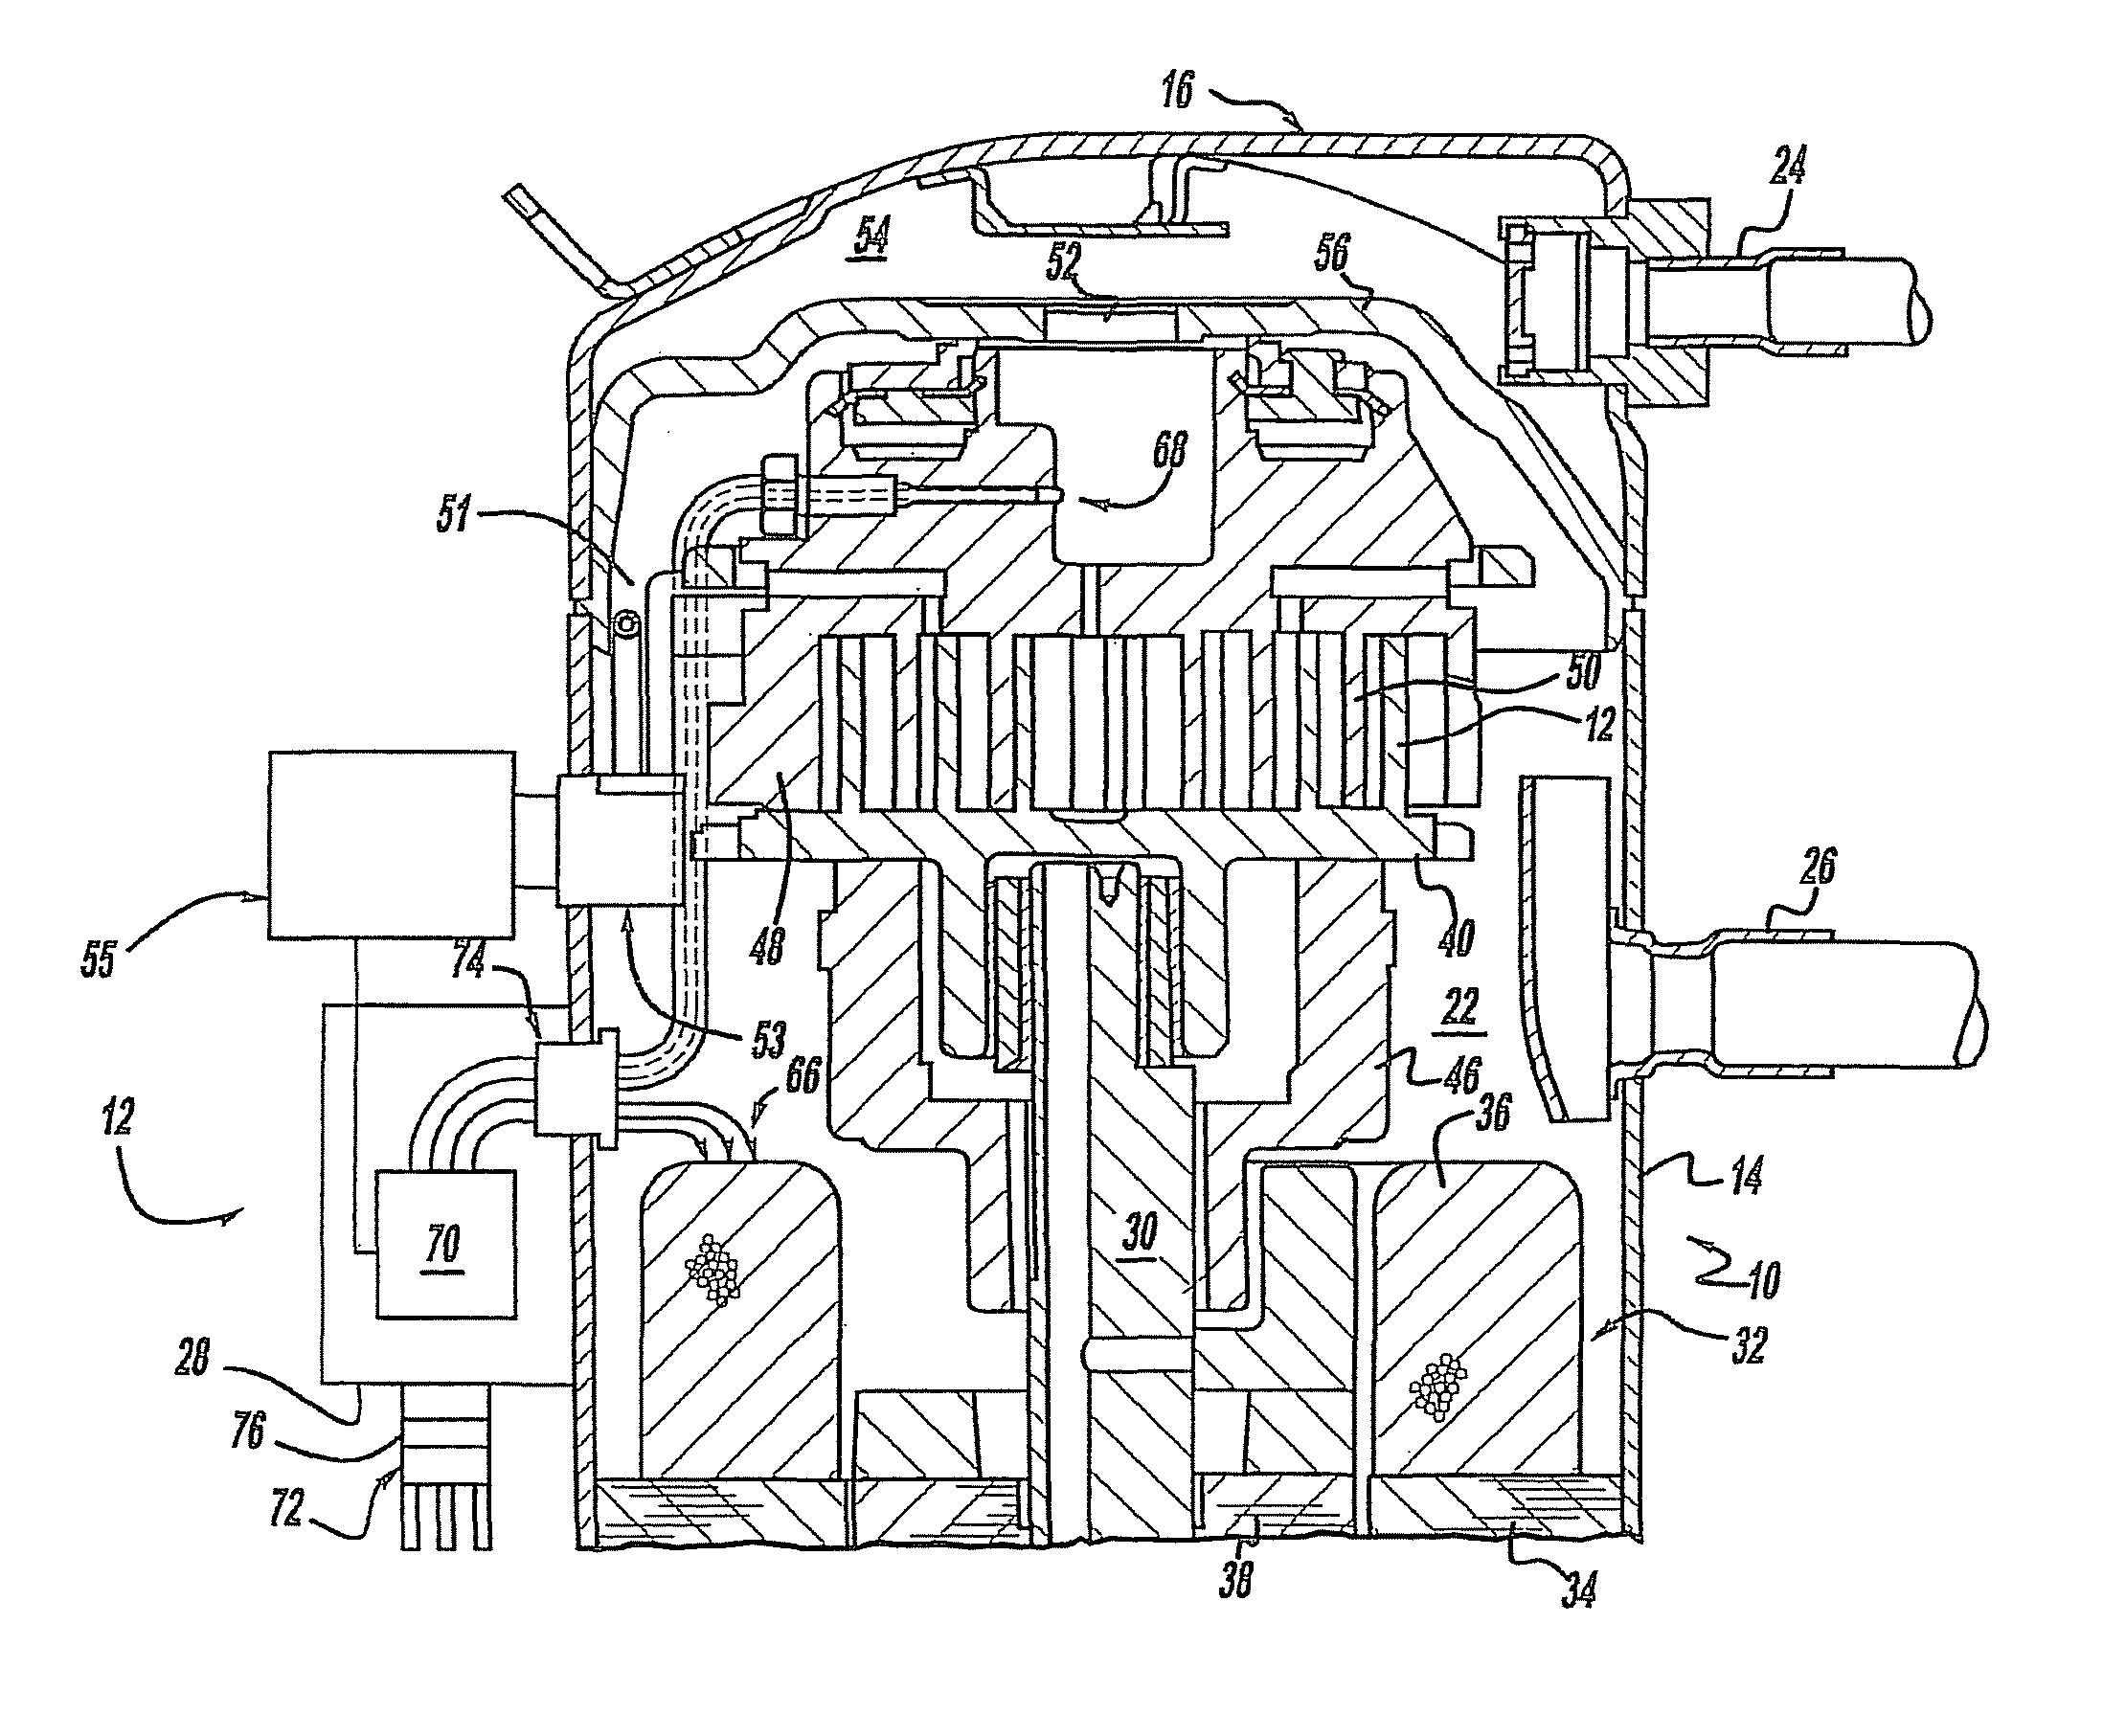 Patent Us 9121407 B2 Mercedes Benz Semi Davco Fuel Filter First Claim